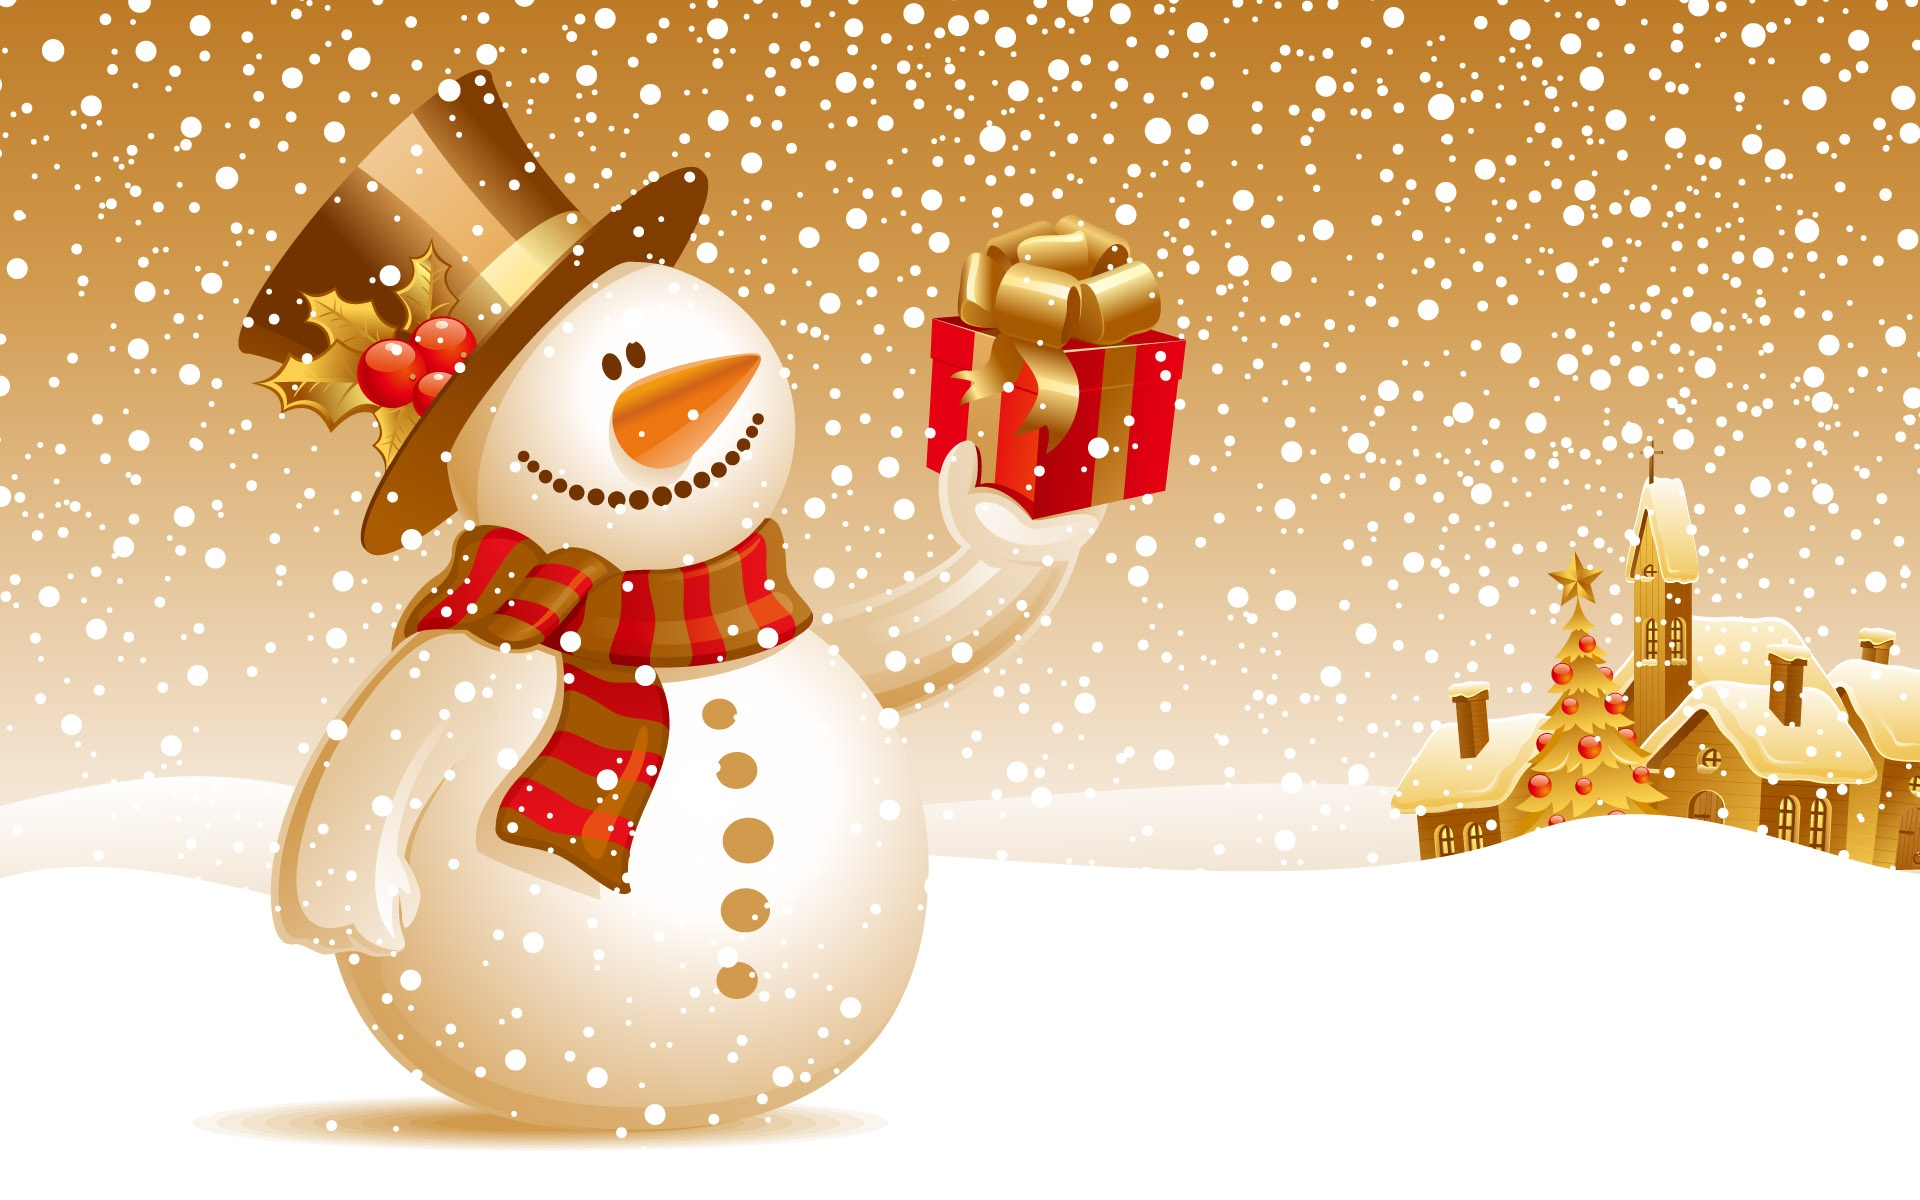 Fond d'ecran Bonhomme de neige Cadeaux - Wallpaper